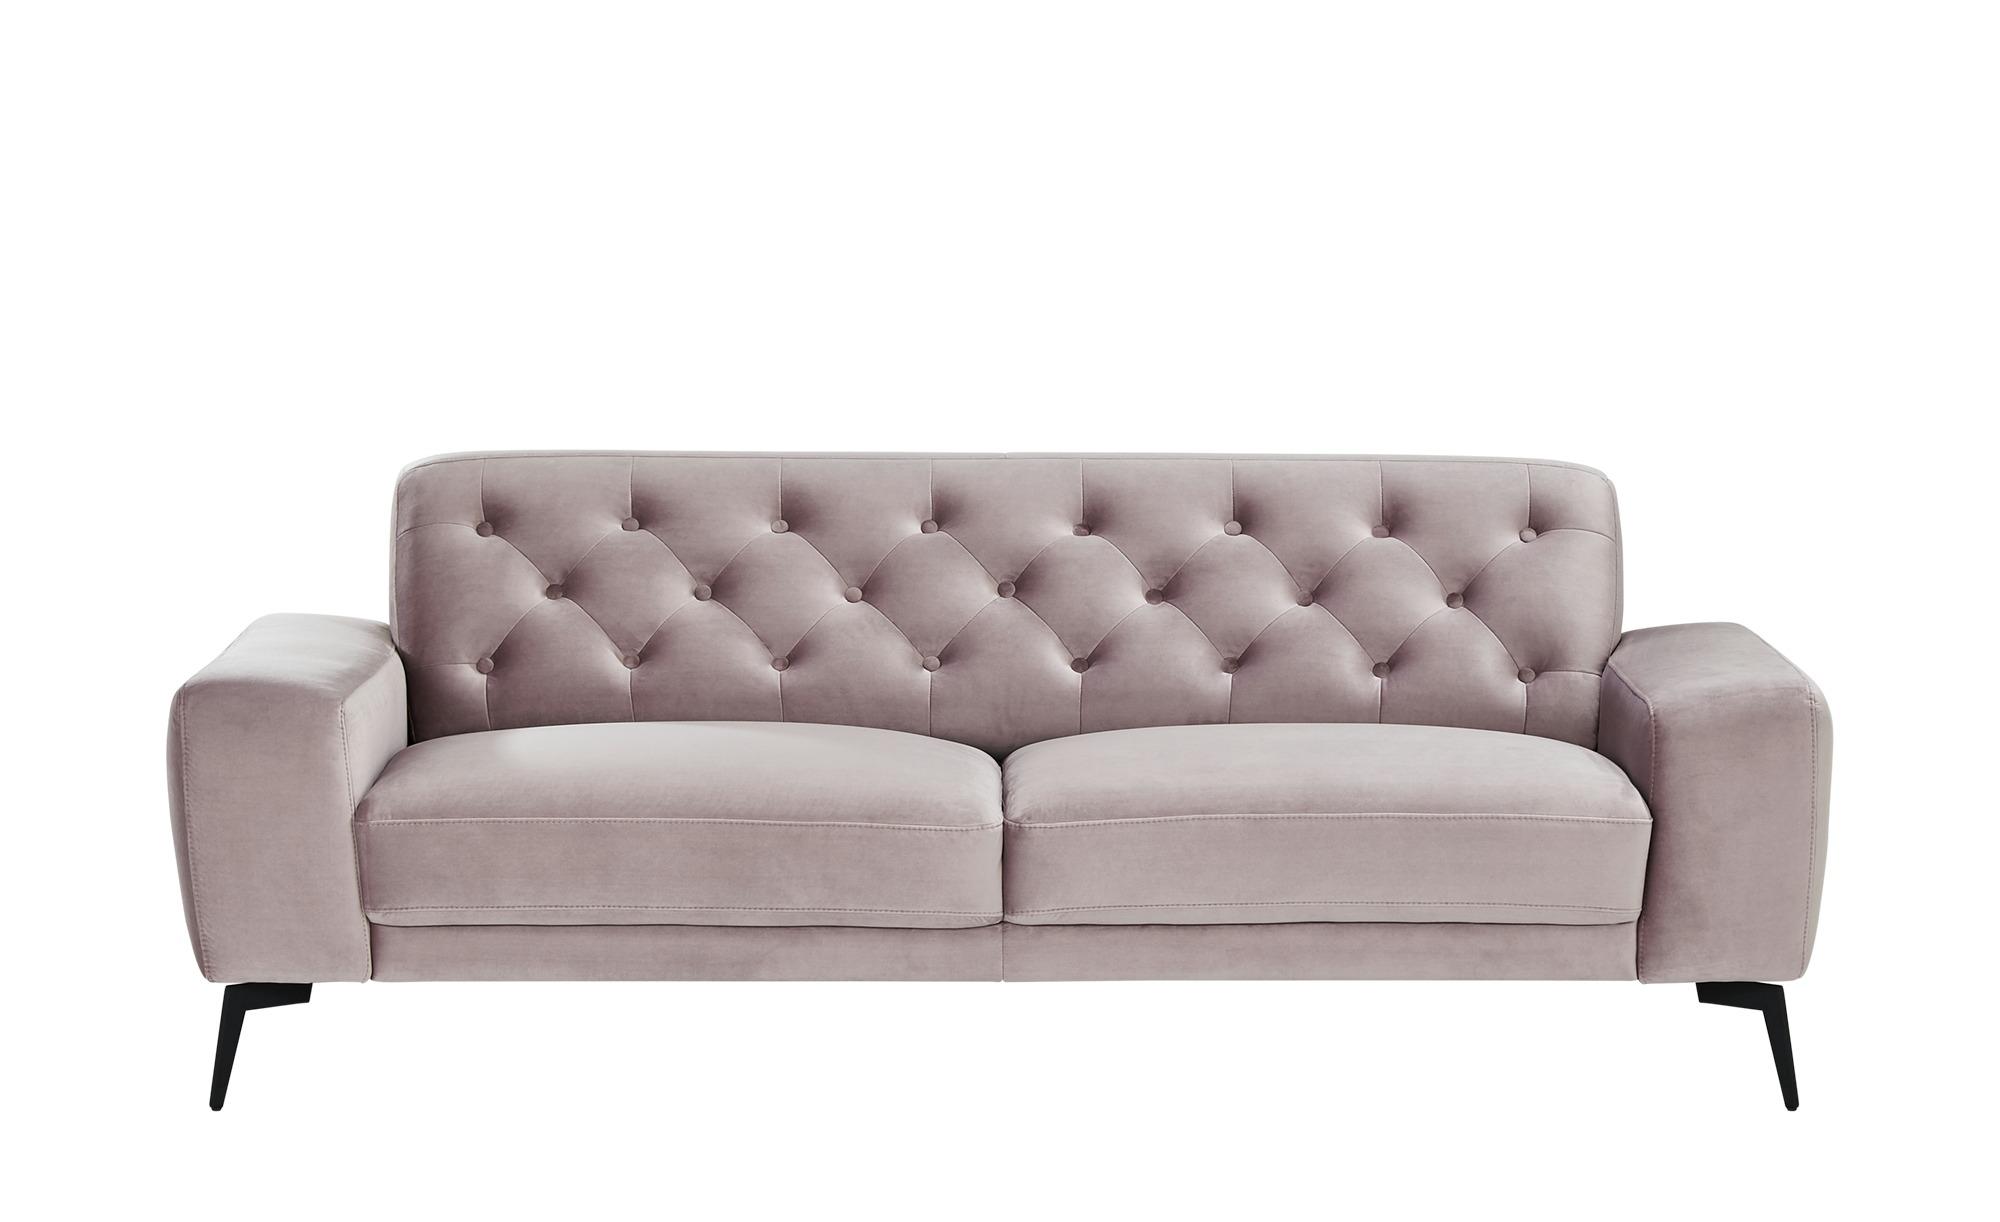 smart Sofa  Alana ¦ rosa/pink ¦ Maße (cm): B: 216 H: 77 T: 95 Polstermöbel > Sofas > 3-Sitzer - Höffner